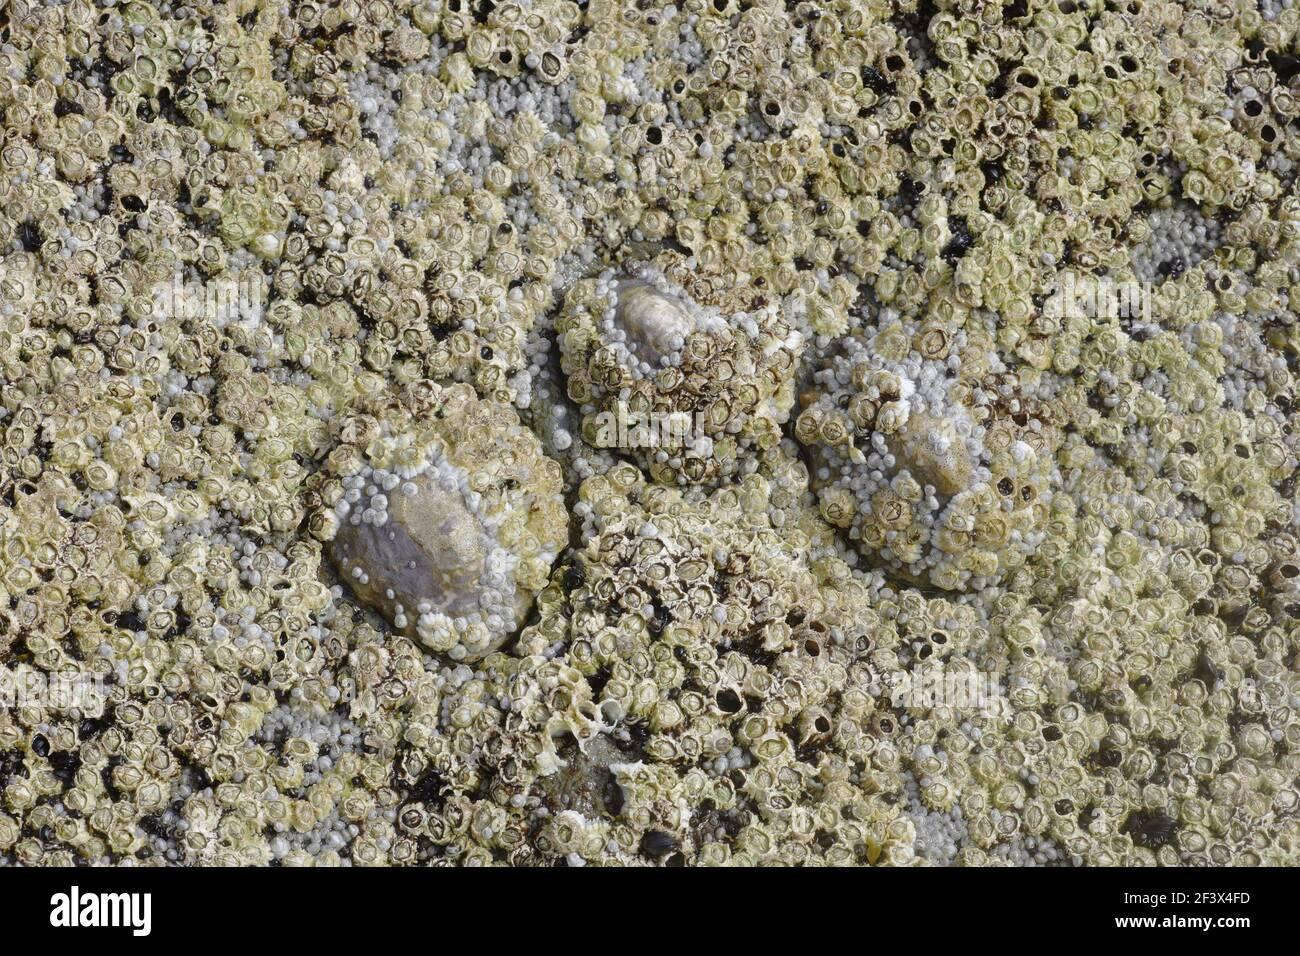 Barnacles de Acorn y Limpet común expuestos a balanoides tideSemibalanus bajos & Patella vulgata cabeza áspera Orkney Mainland IN000921 Foto de stock